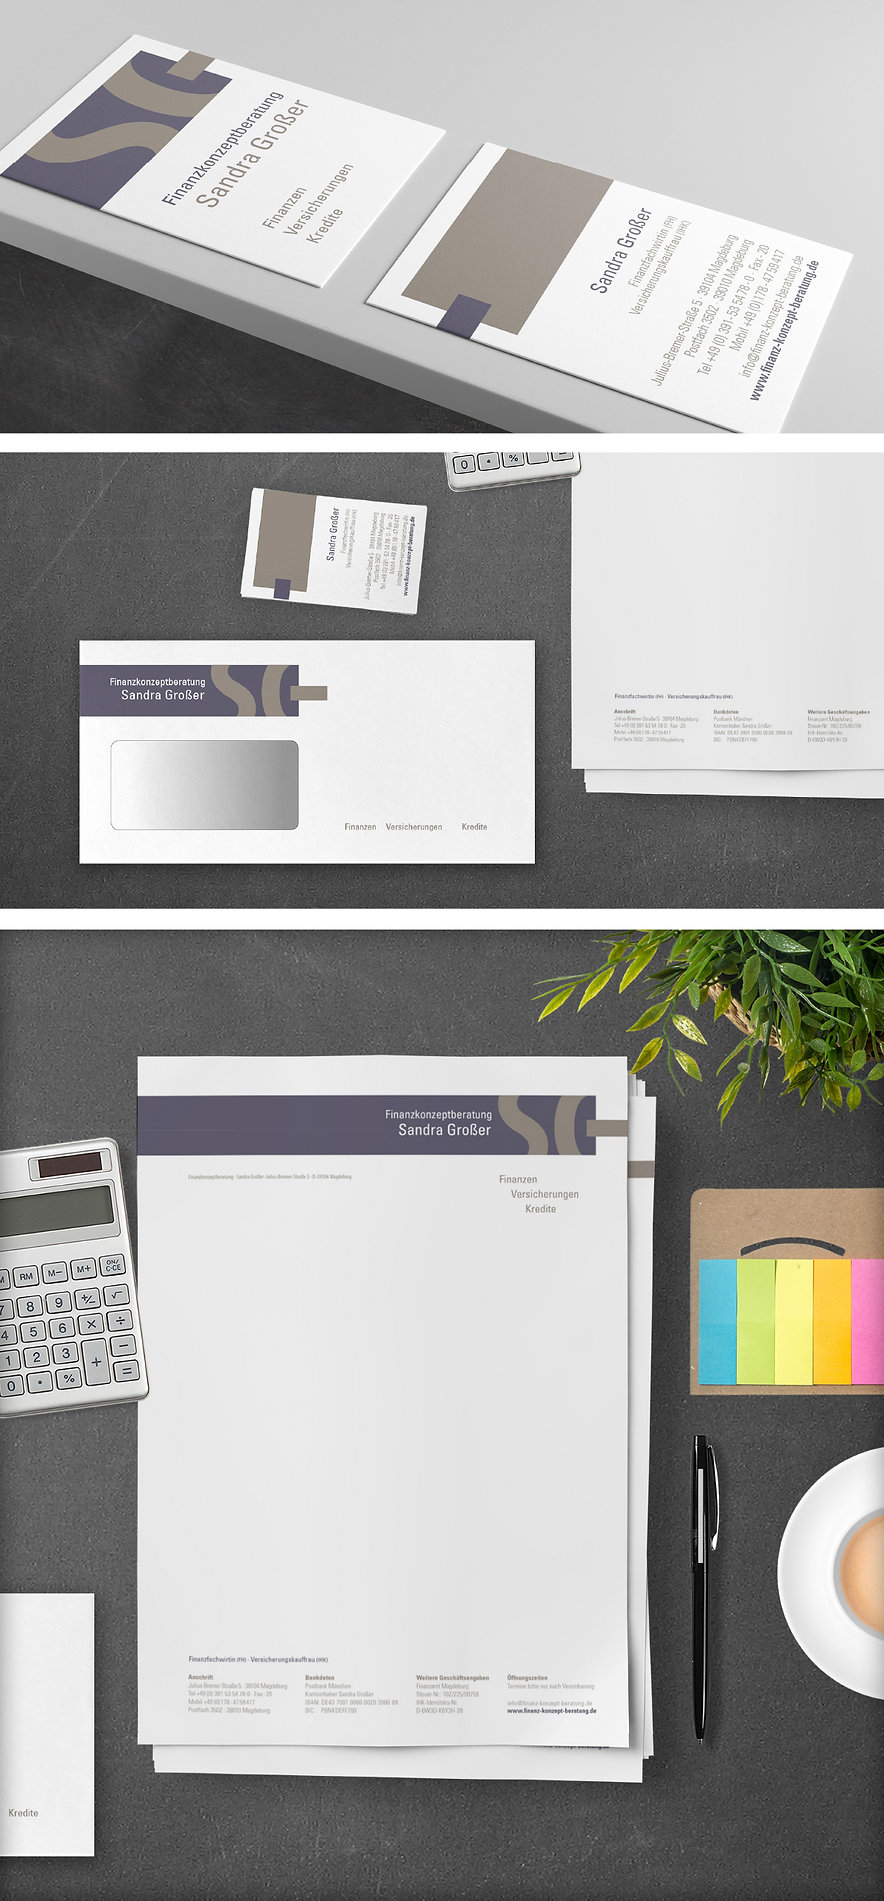 Sandra Grosser – Corporate Design